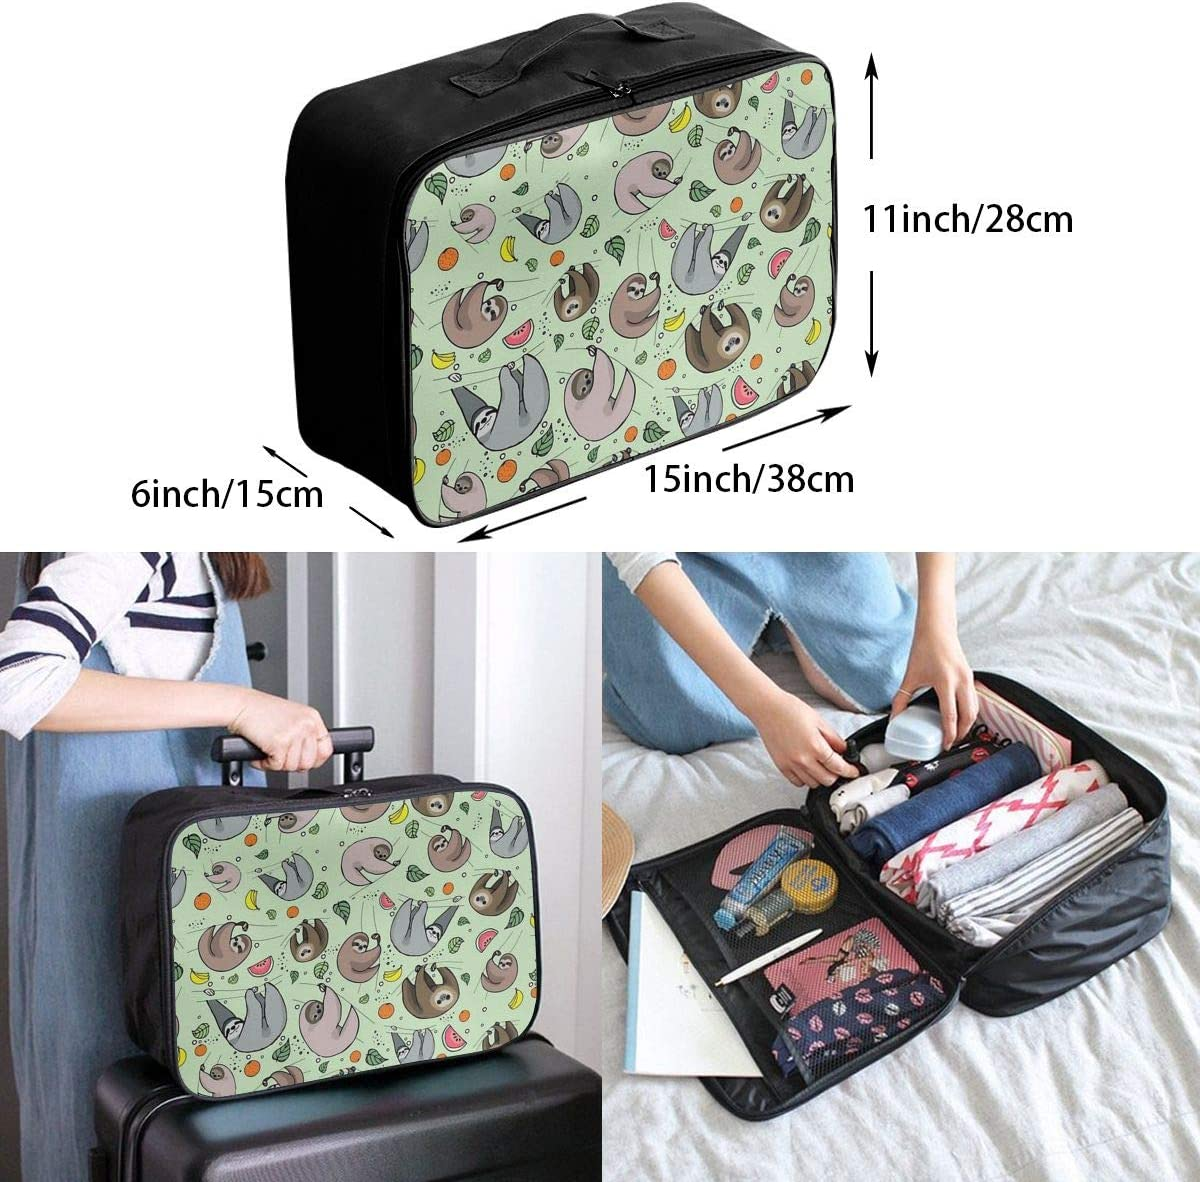 Cartoon Funny Sloth Travel Carry-on Luggage Weekender Bag Overnight Tote Flight Duffel In Trolley Handle